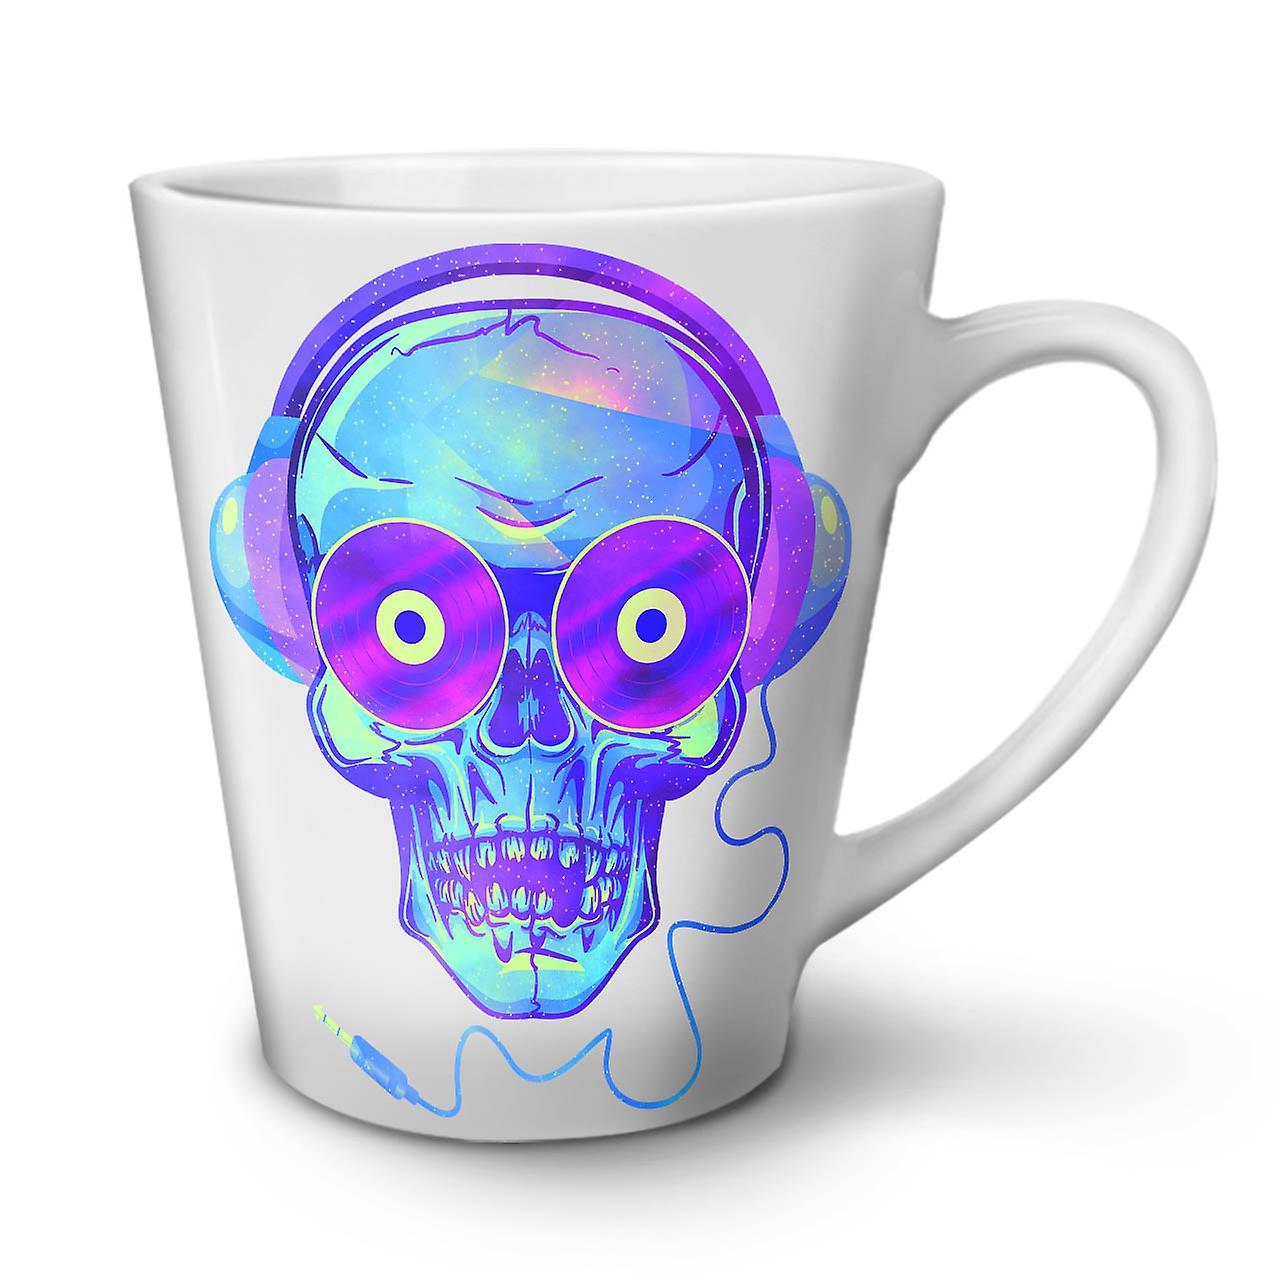 OzWellcoda Casque Café Skull Blanche En 12 Nouvelle Céramique Latte Tasse zpqVSUM